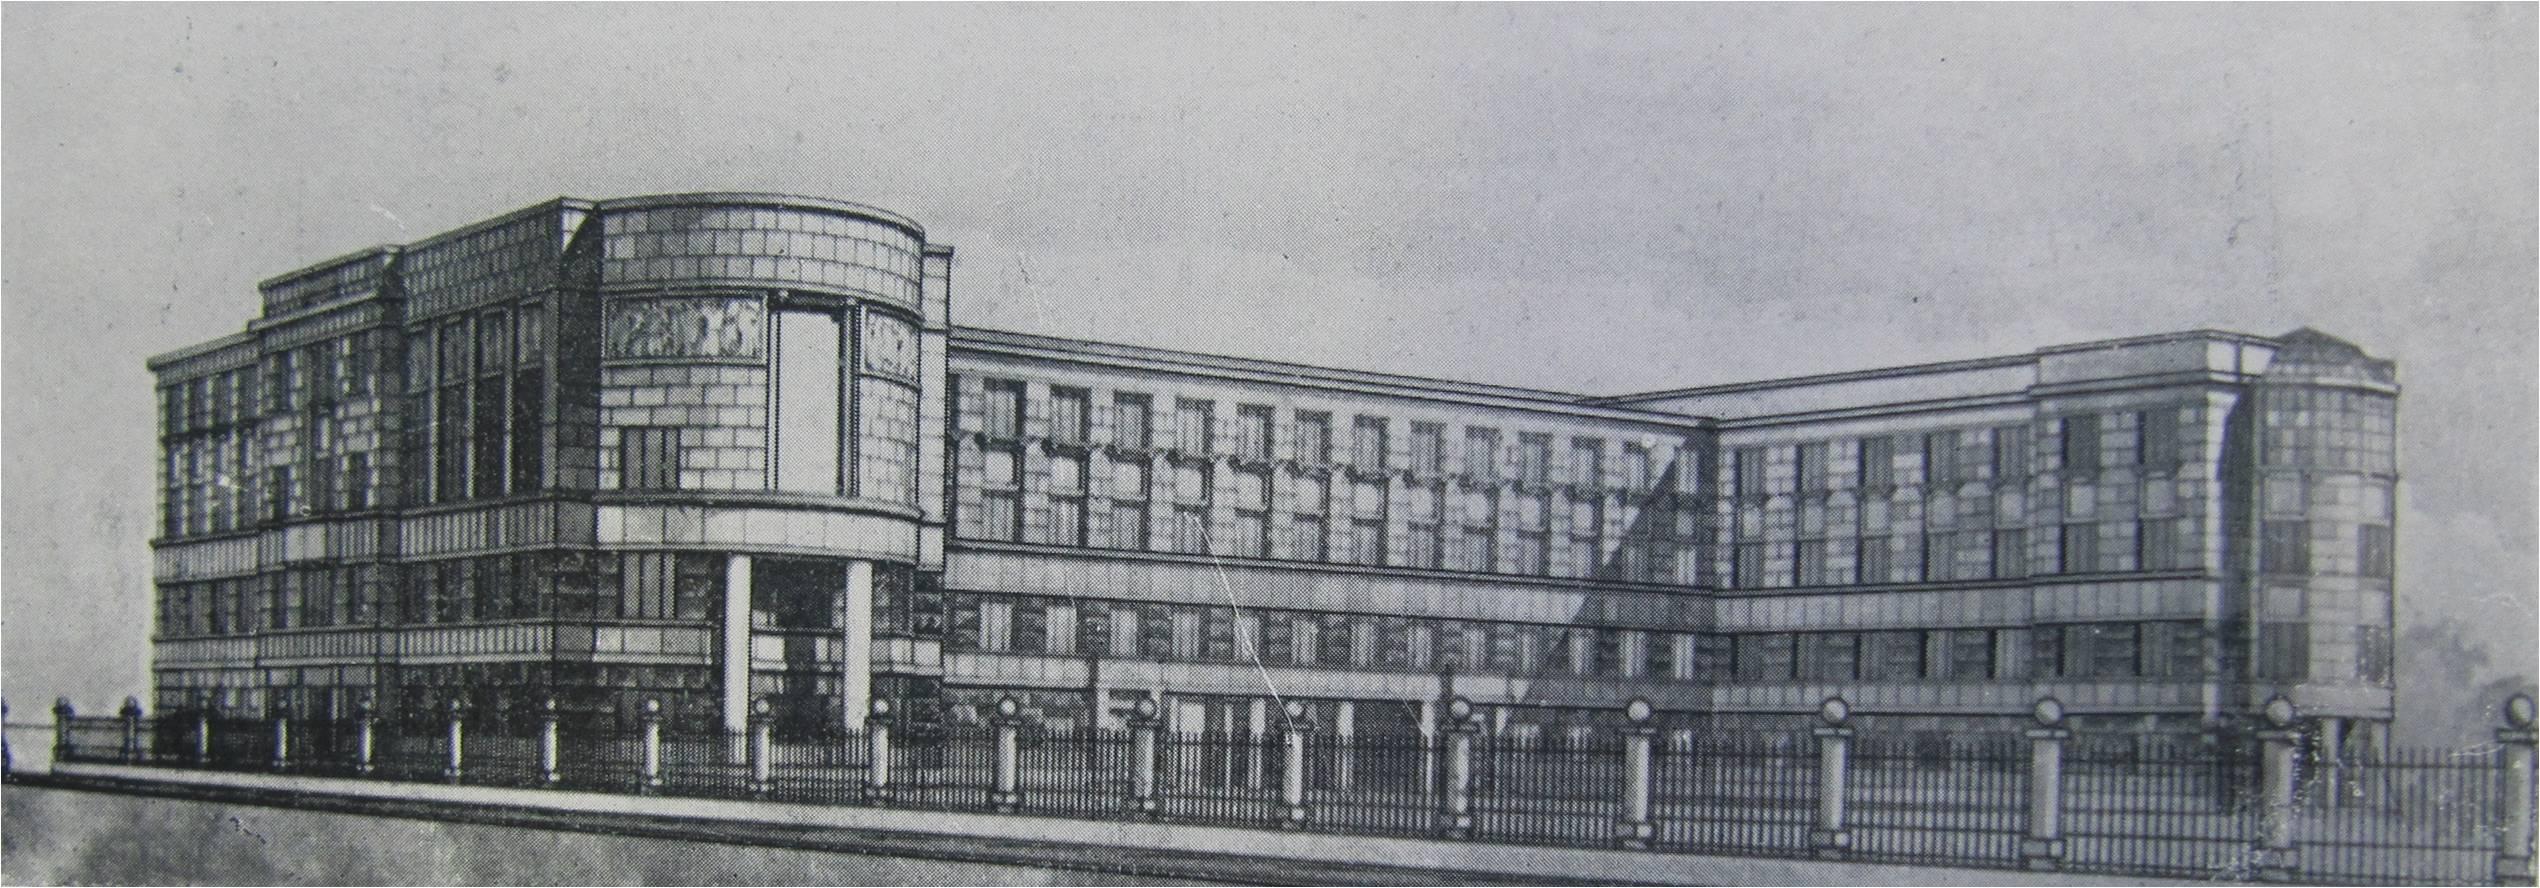 2.Московский пр., 80. Школа. 1934-1936 гг. Проект.